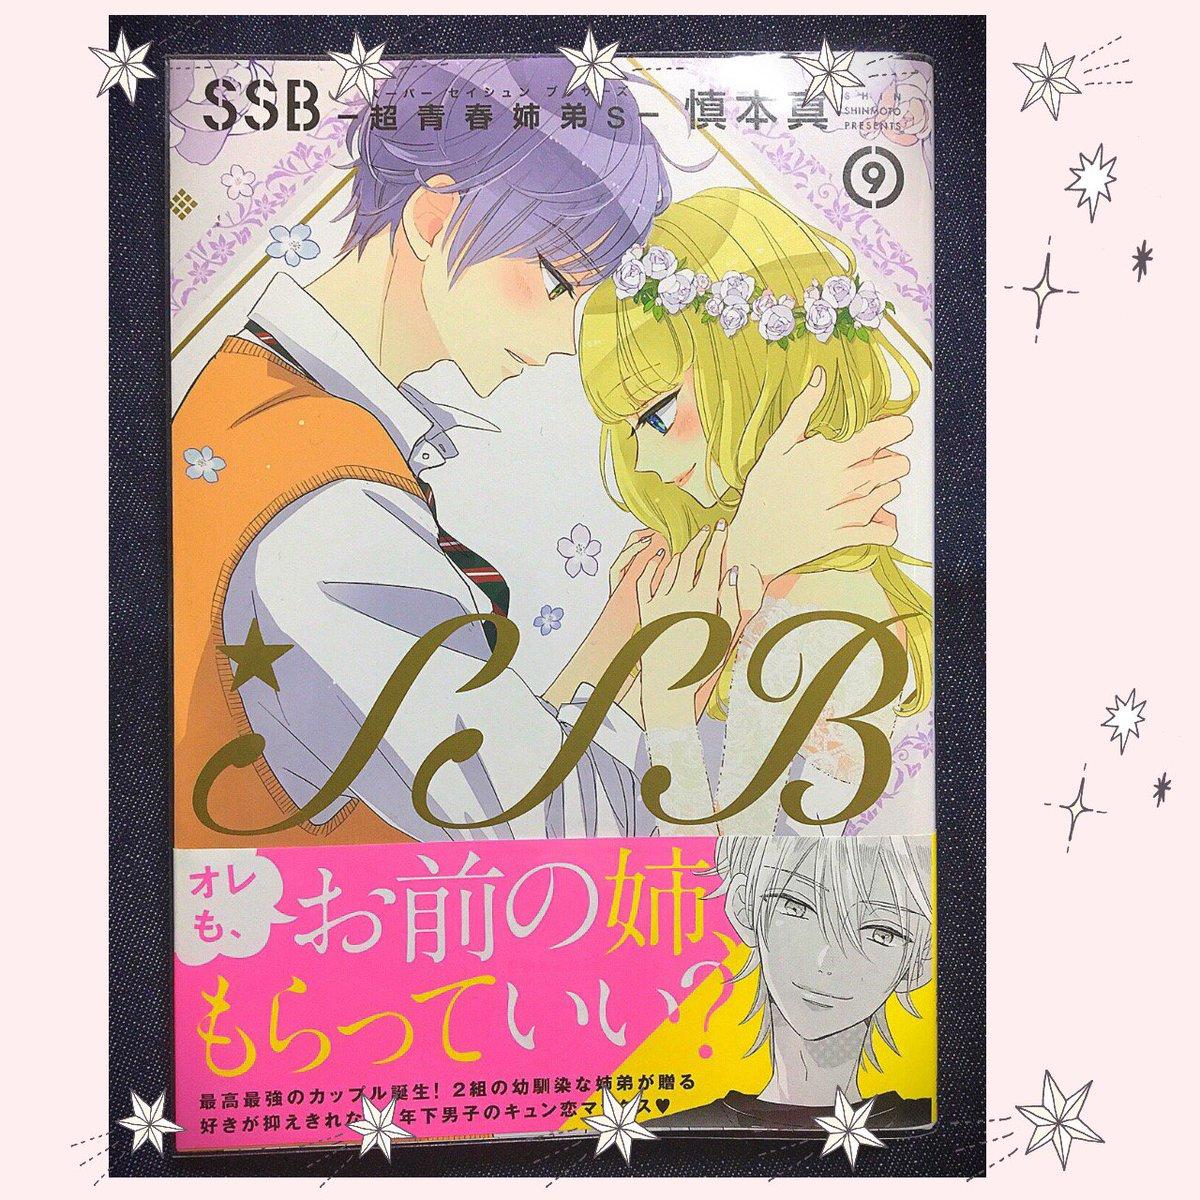 【SSB -超青春姉弟s-】第9巻。もう9巻目。いや、まだ9巻目。まだまだ続いて欲しい大好きな作品。マコちゃんがヒロイン